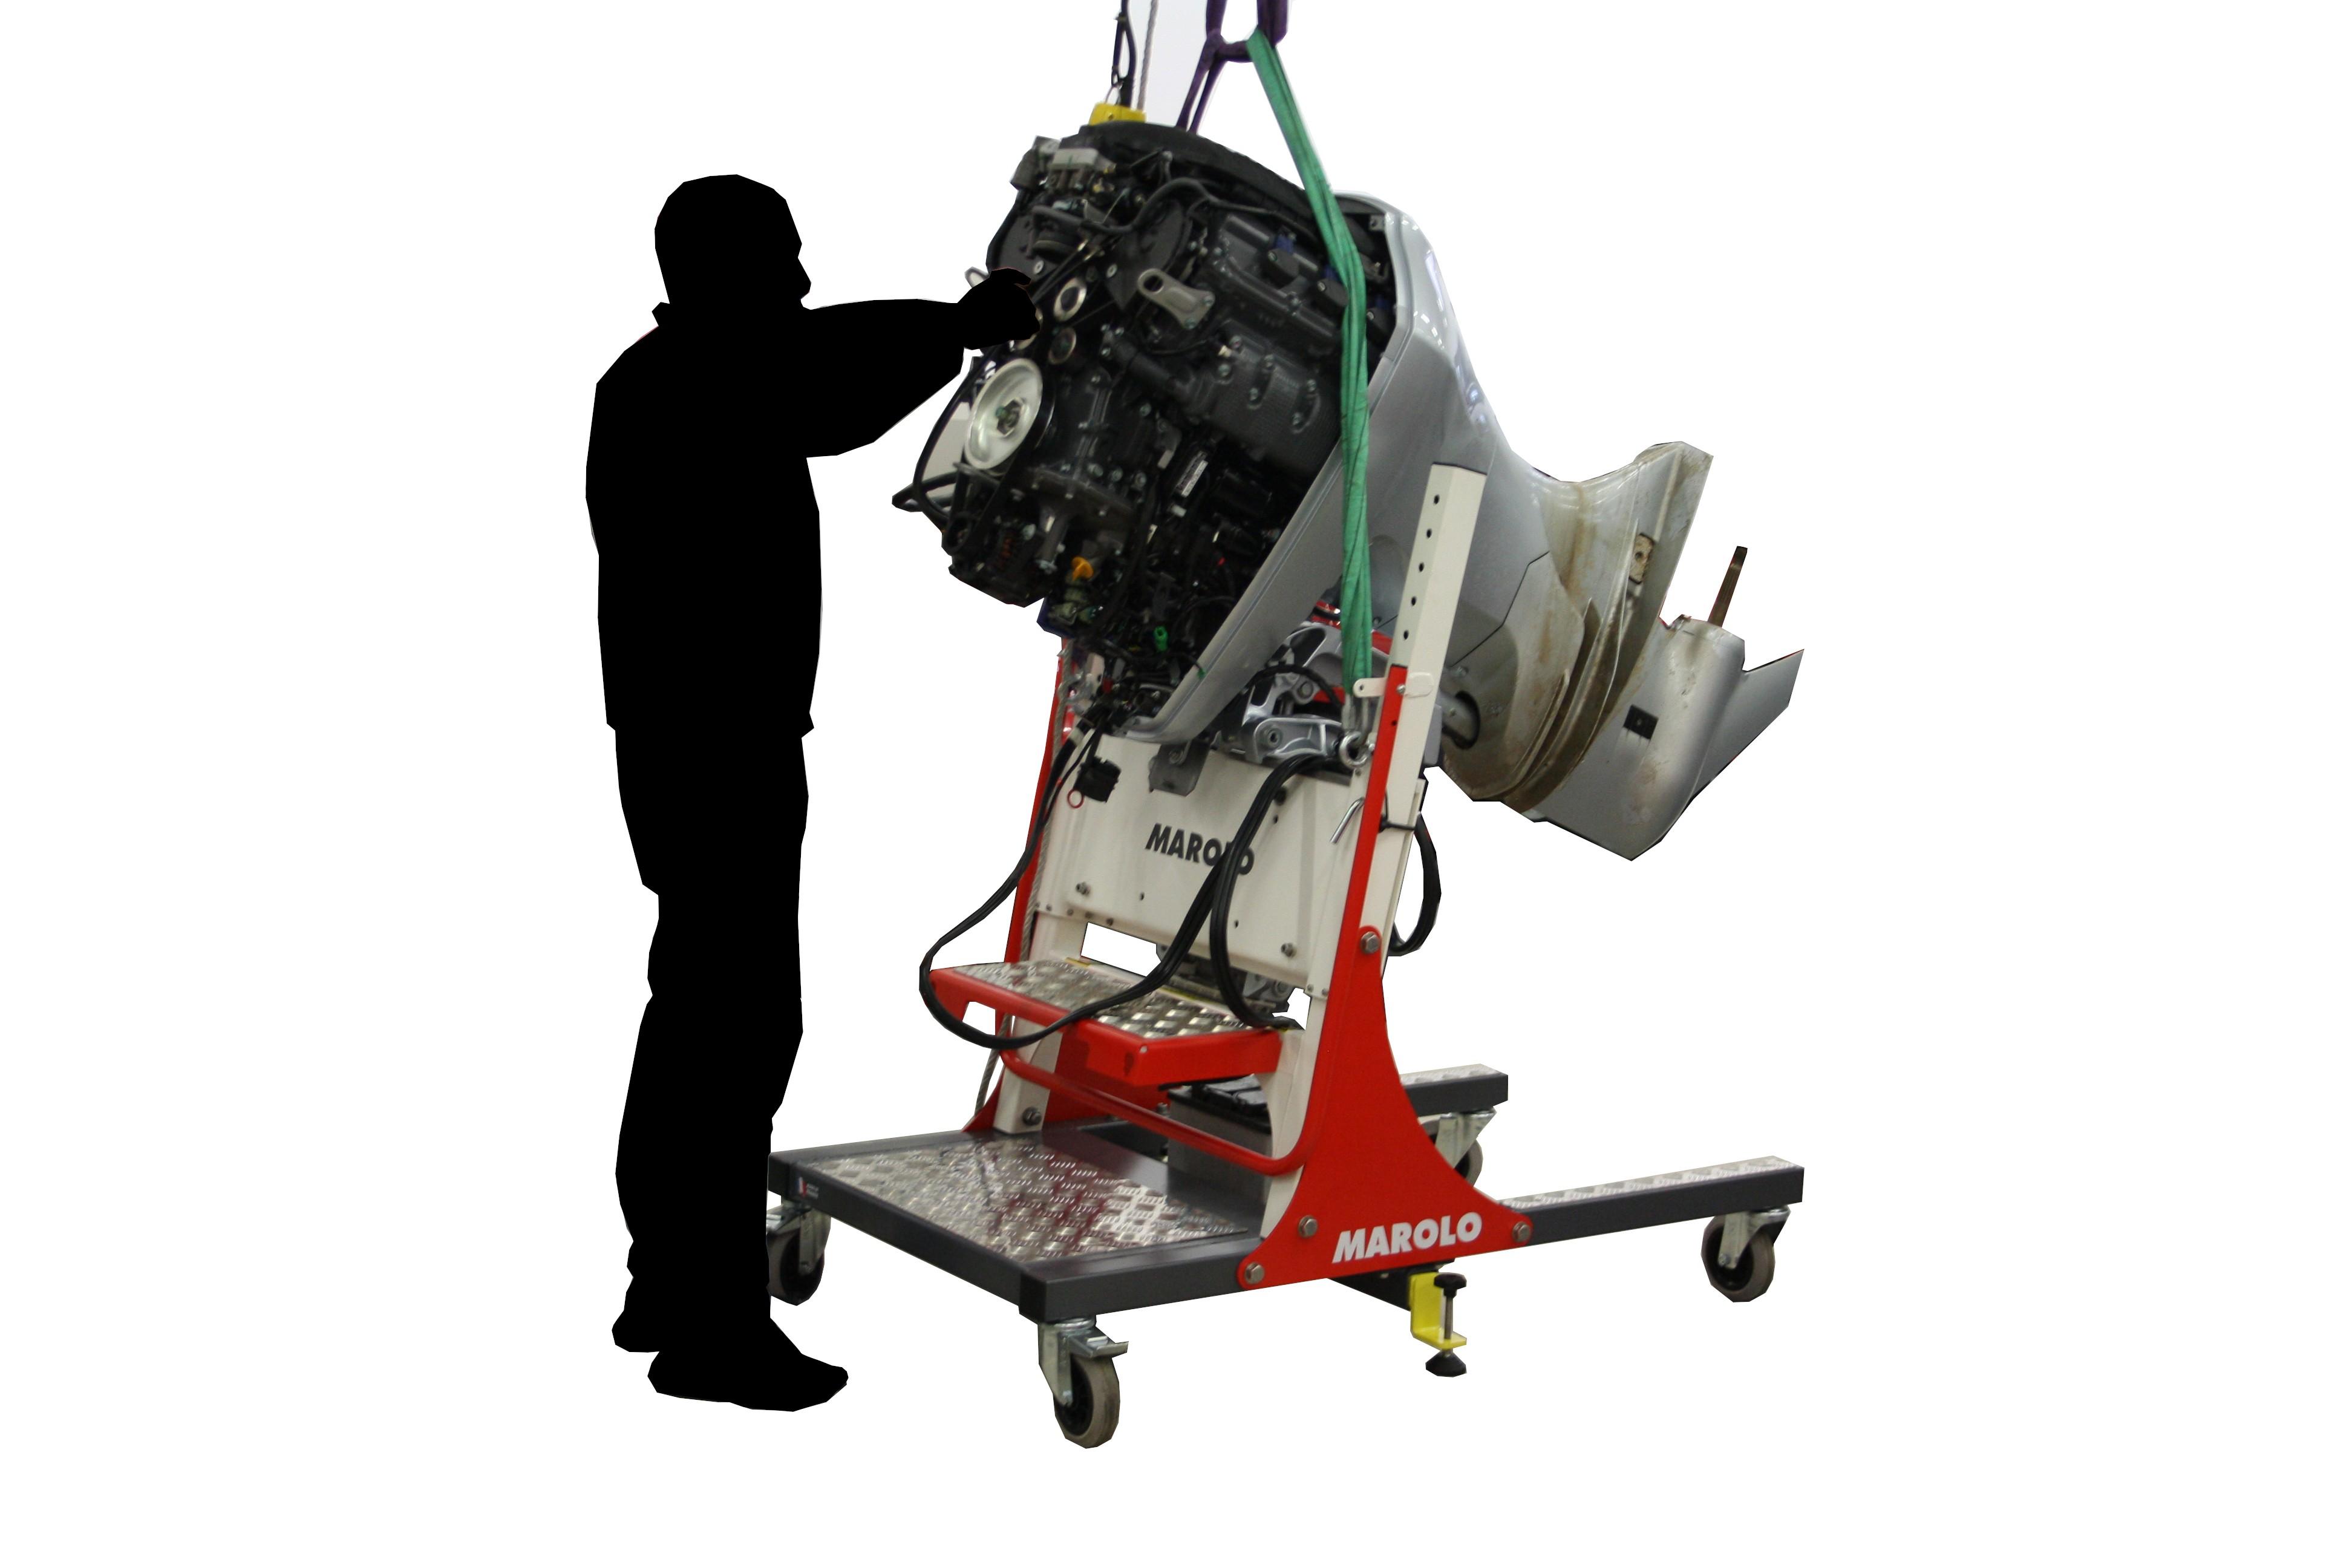 Marolotest outboard engine stand marolo sm 450